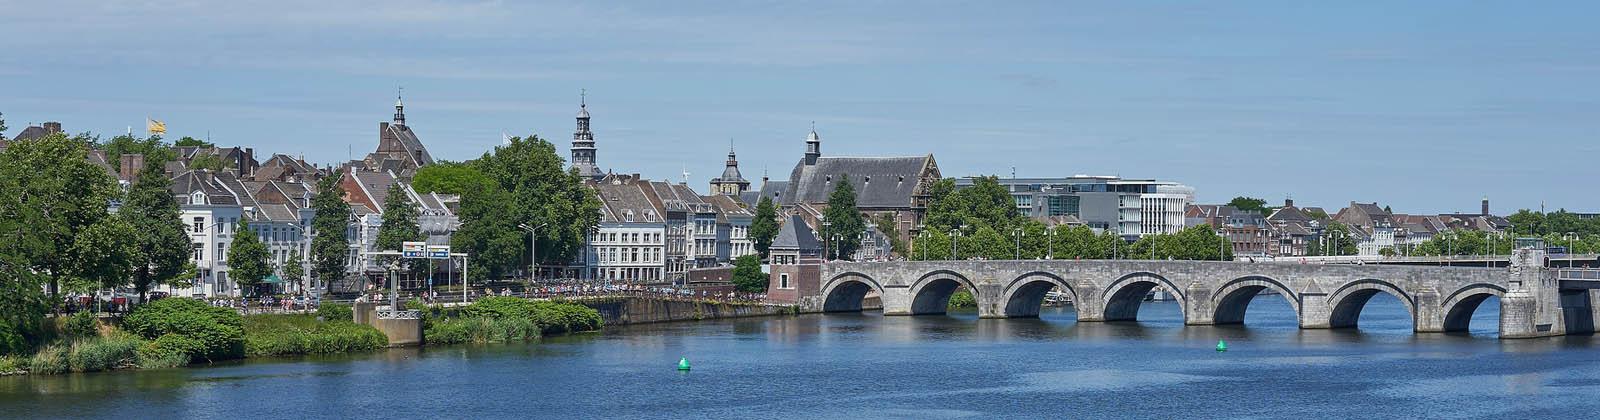 DMC-Maastricht-travel-agency